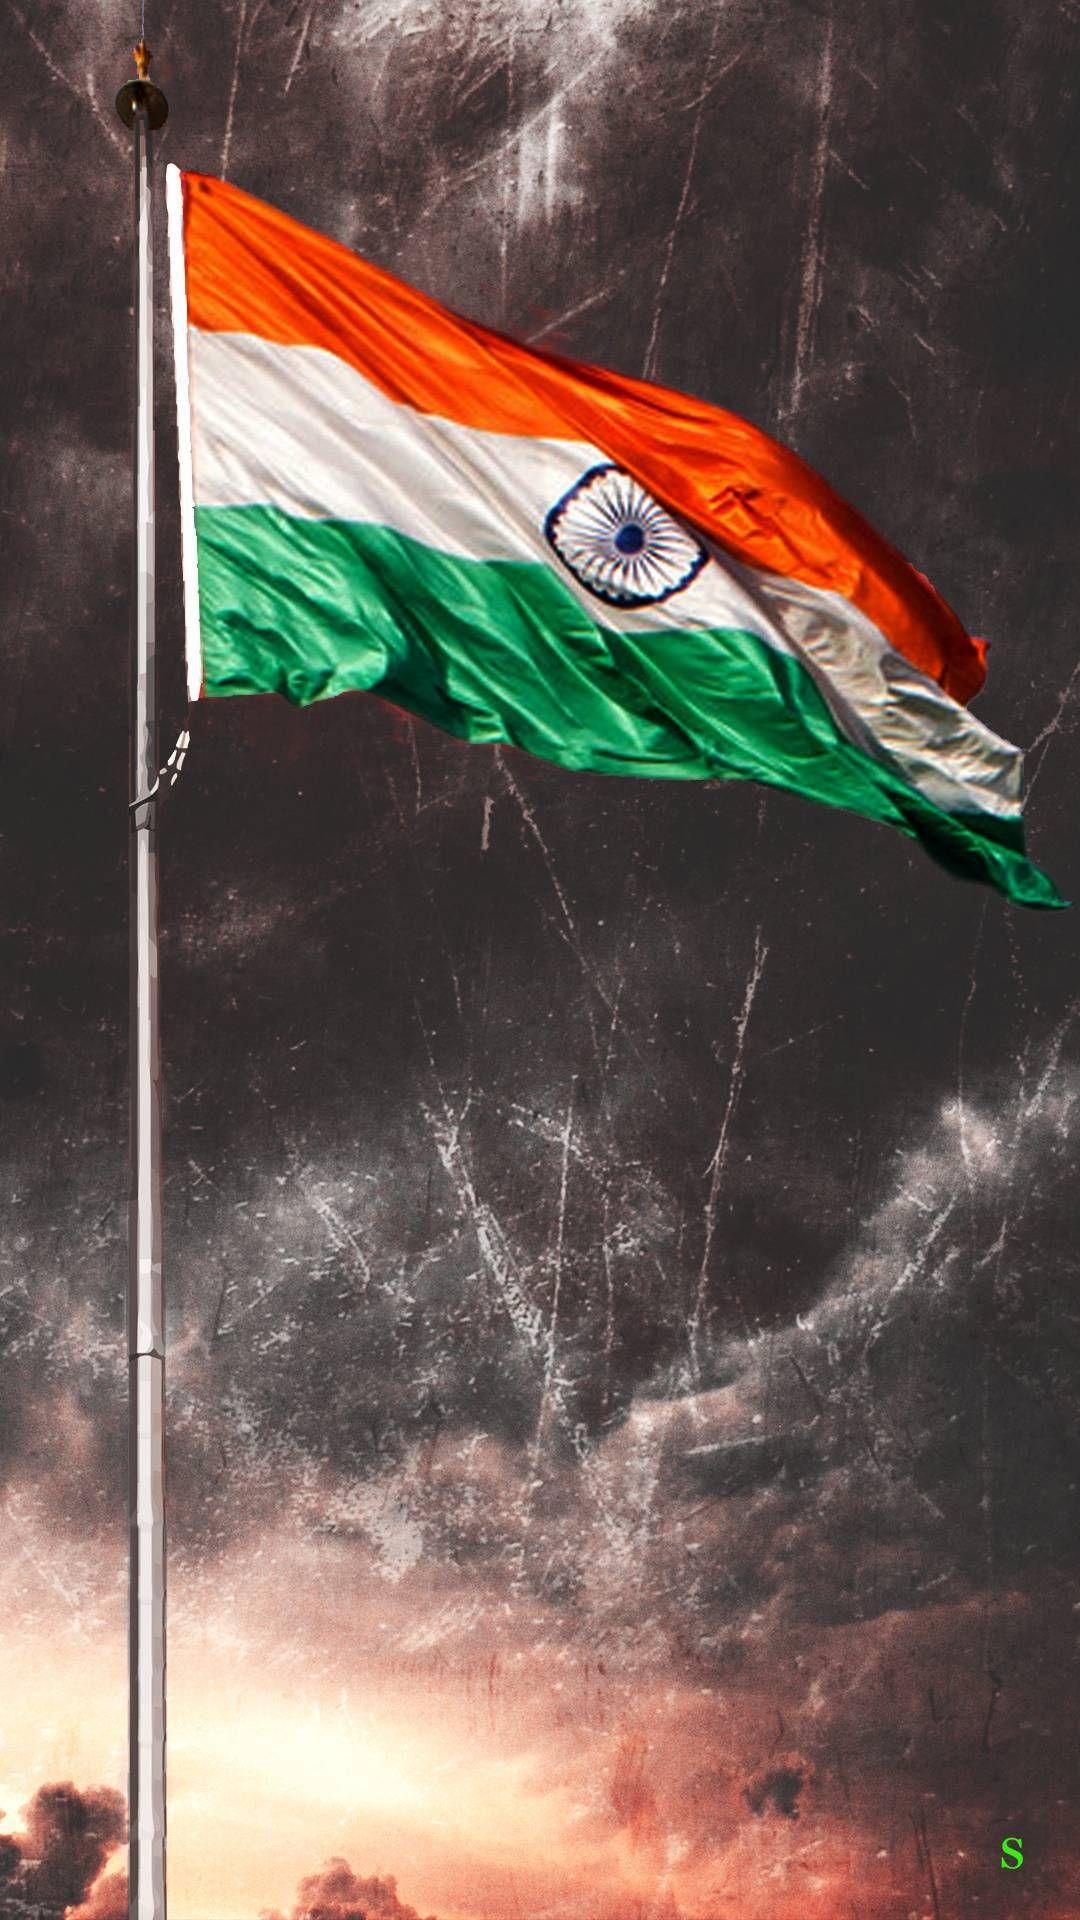 Tiranga Flag Iphone Wallpaper Indian Flag Wallpaper Tiranga Flag Indian Flag Images